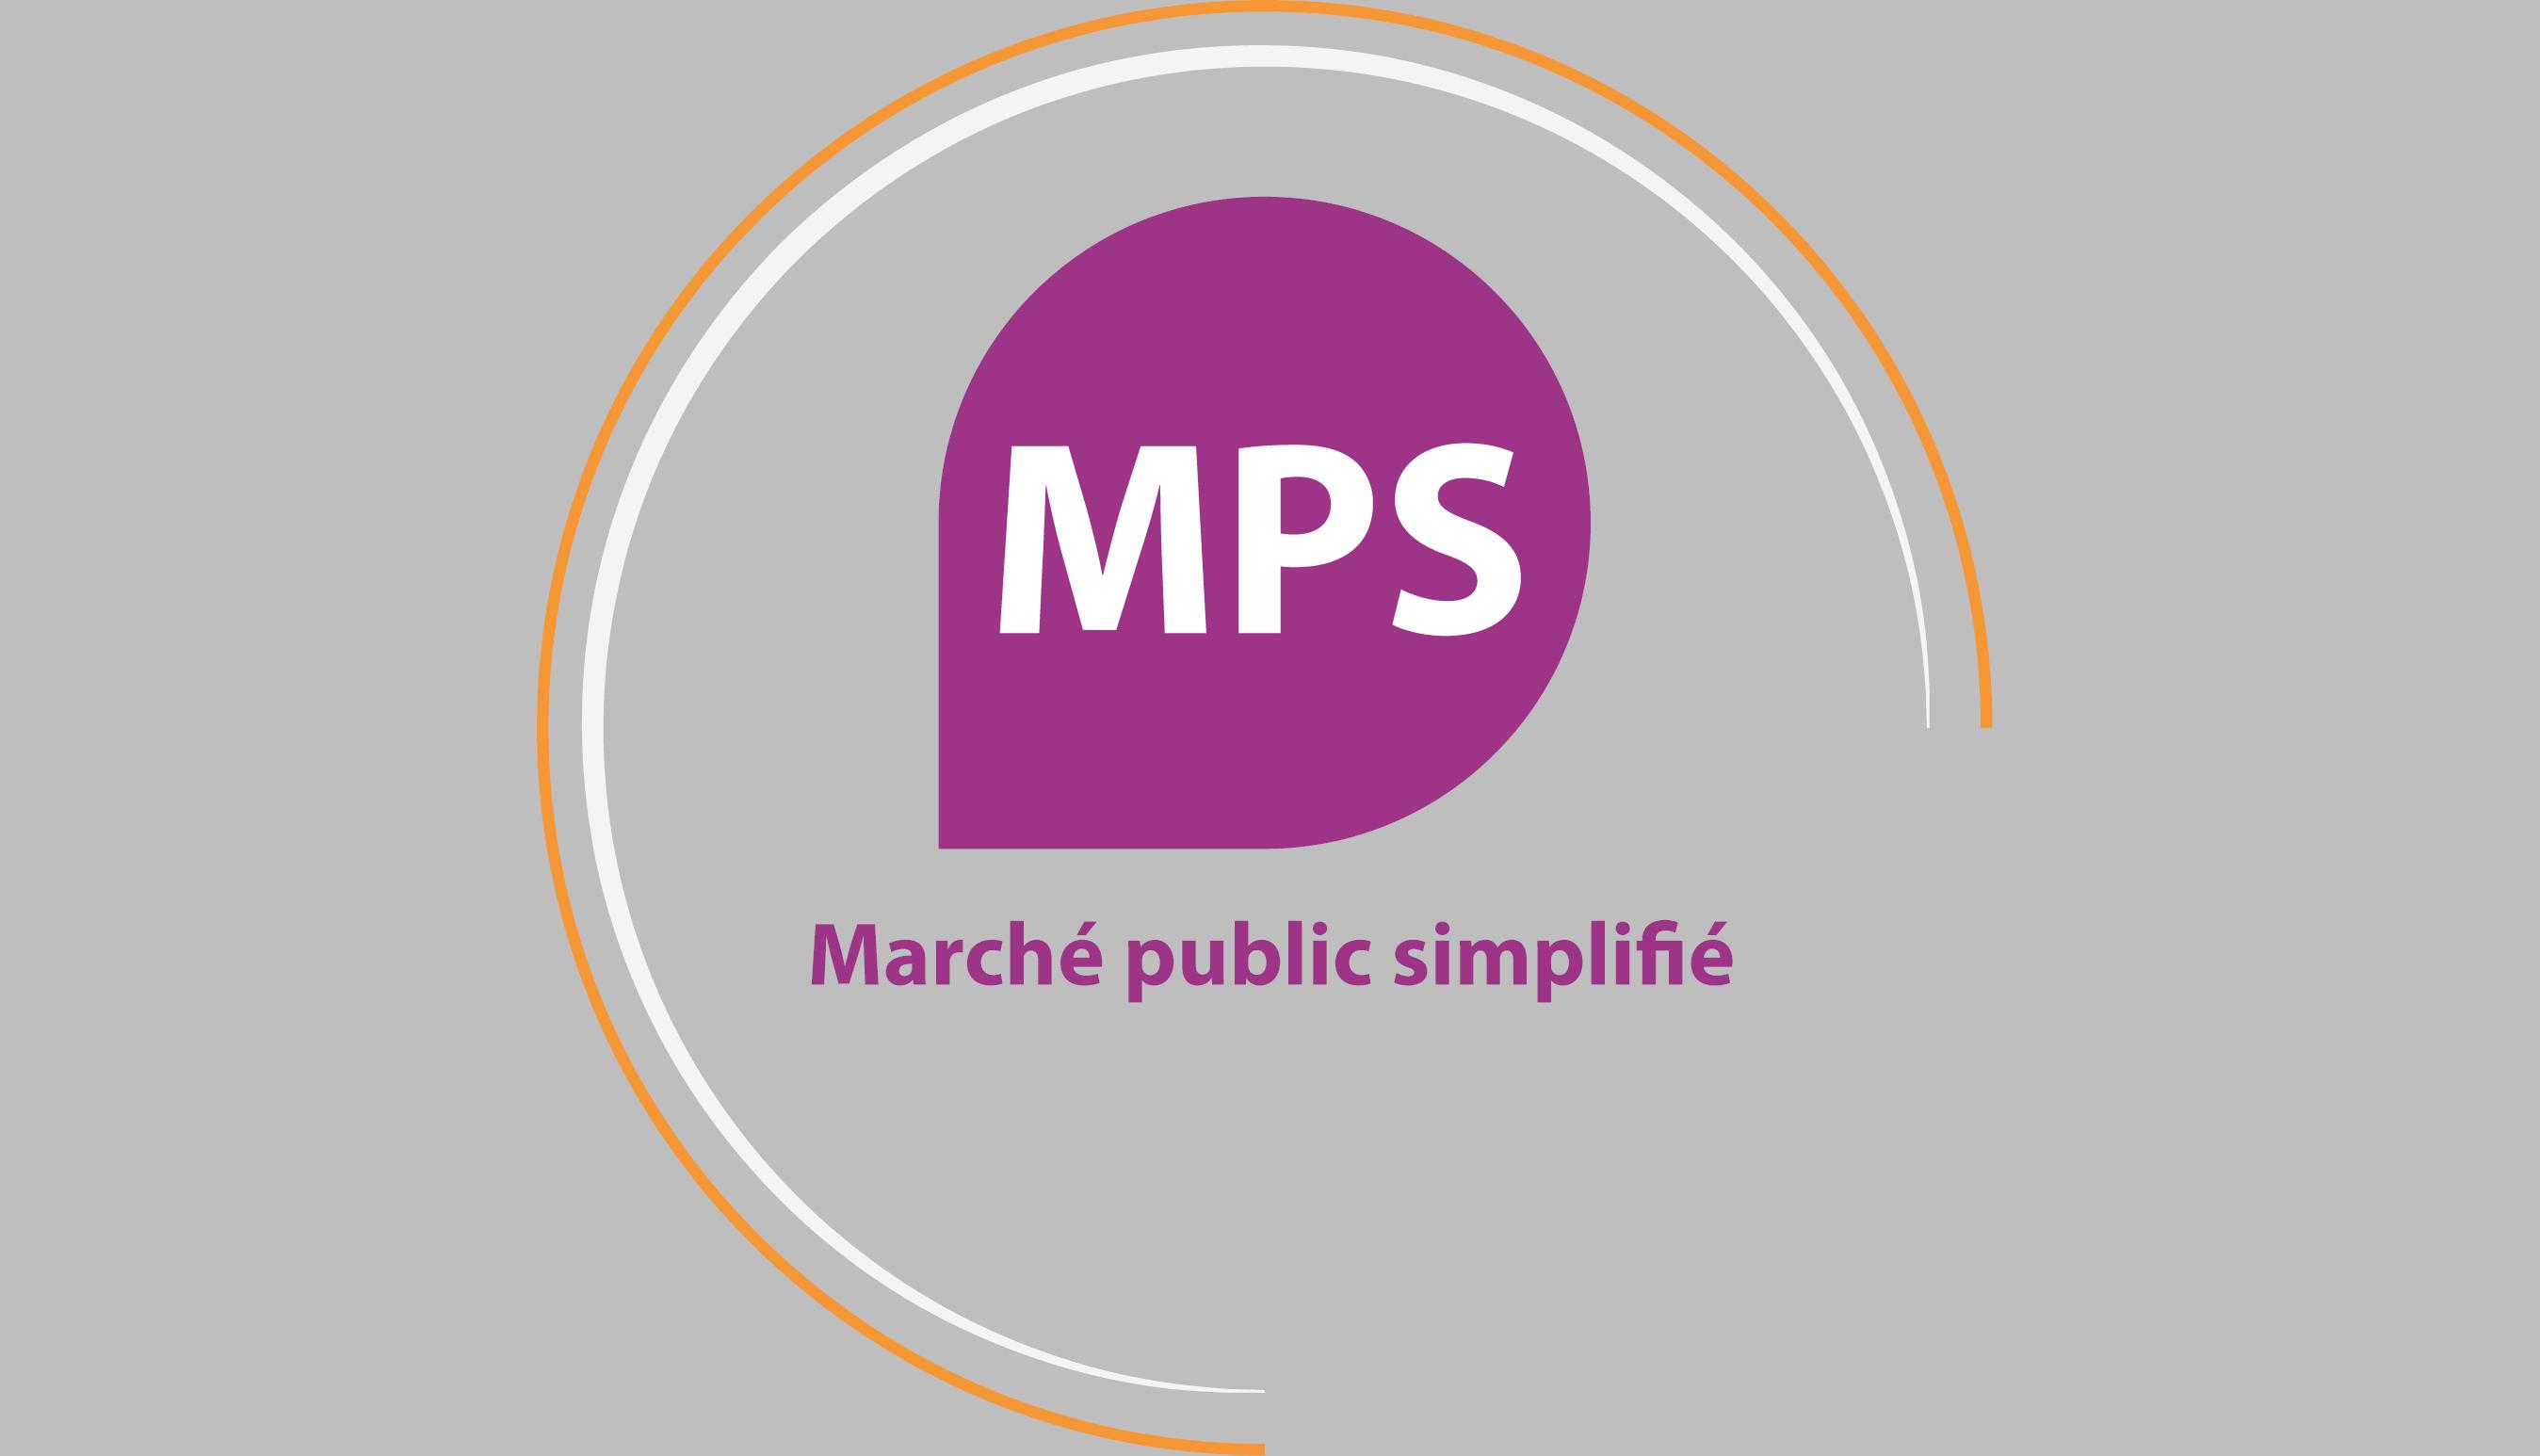 logo_mps-6e8afebc4cac852ff6102ba5e0bea983.png